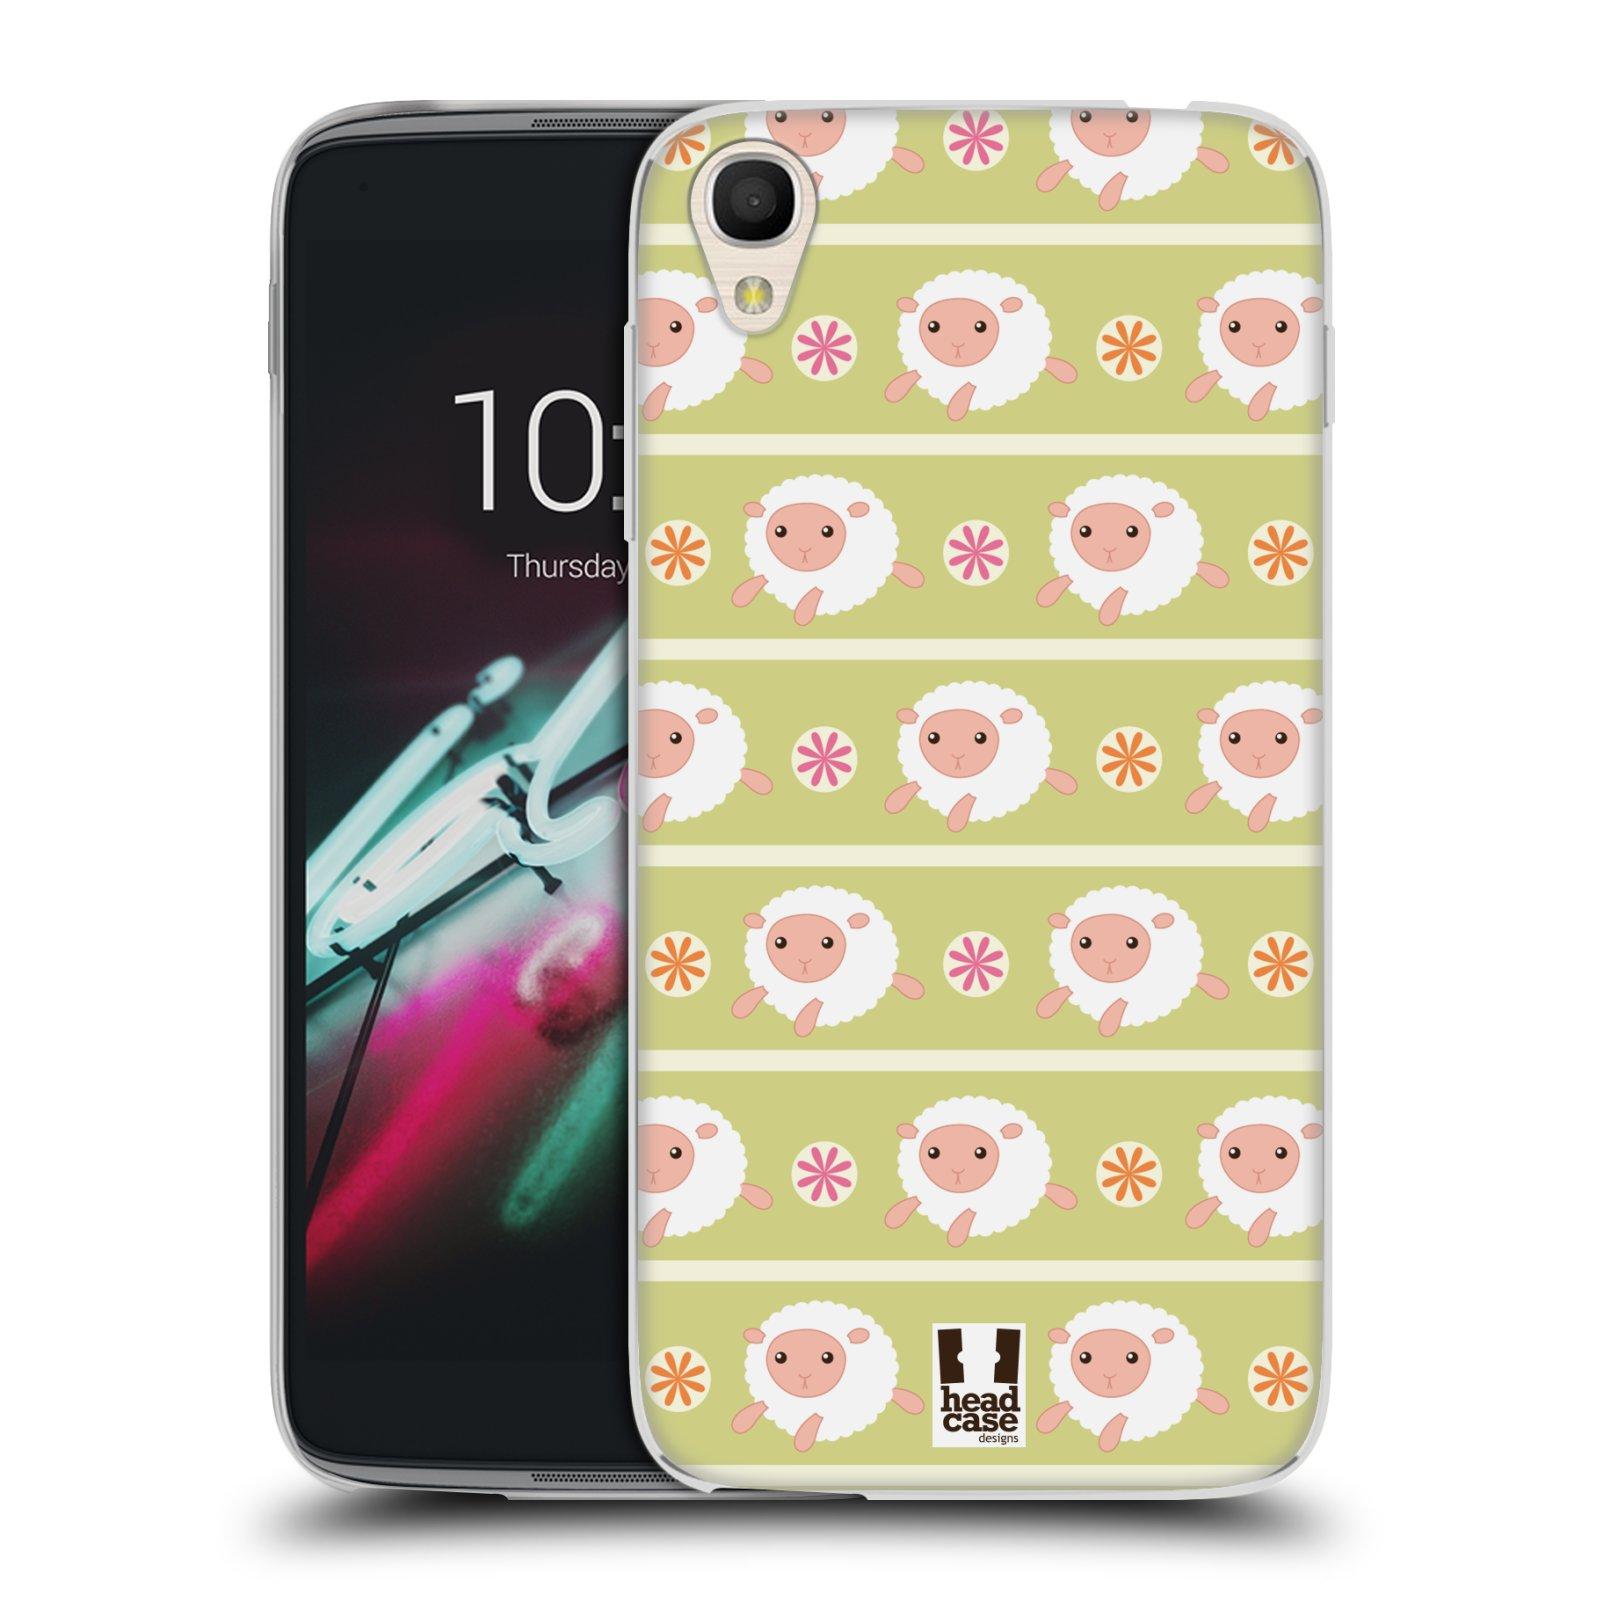 HEAD CASE silikonový obal na mobil Alcatel Idol 3 OT-6039Y (4.7) vzor roztomilé zvířecí vzory ovečky